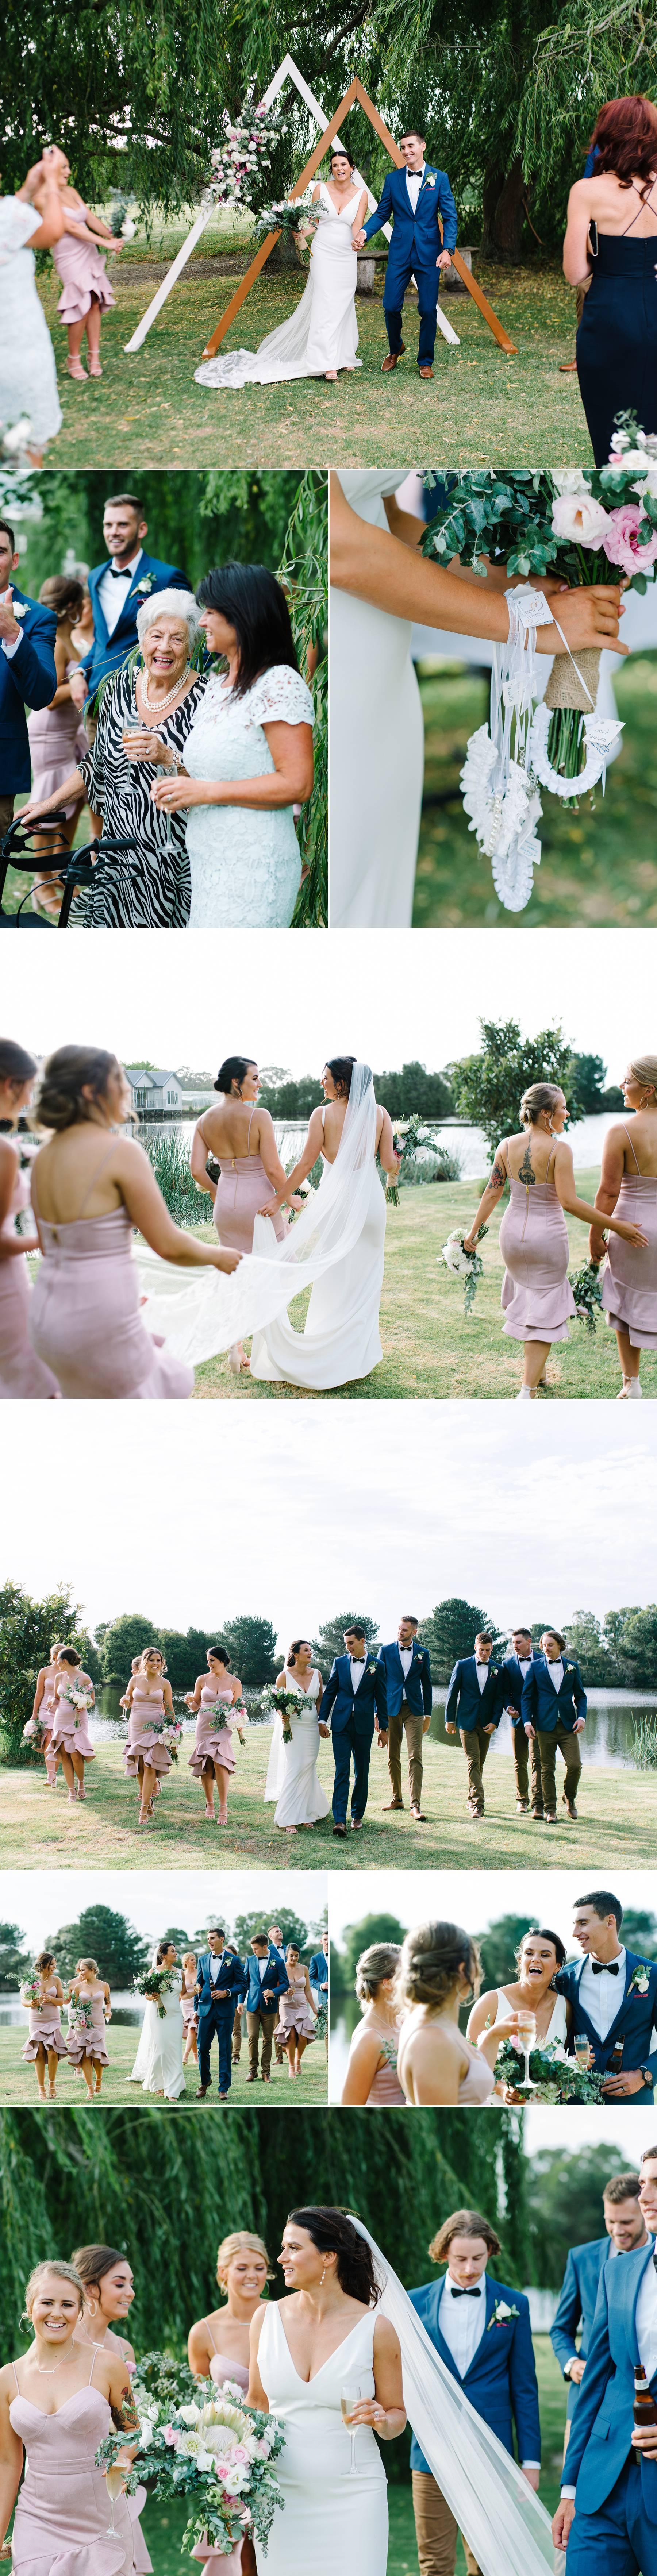 Mornington peninsula wedding ceremony photographs by Michelle Pragt